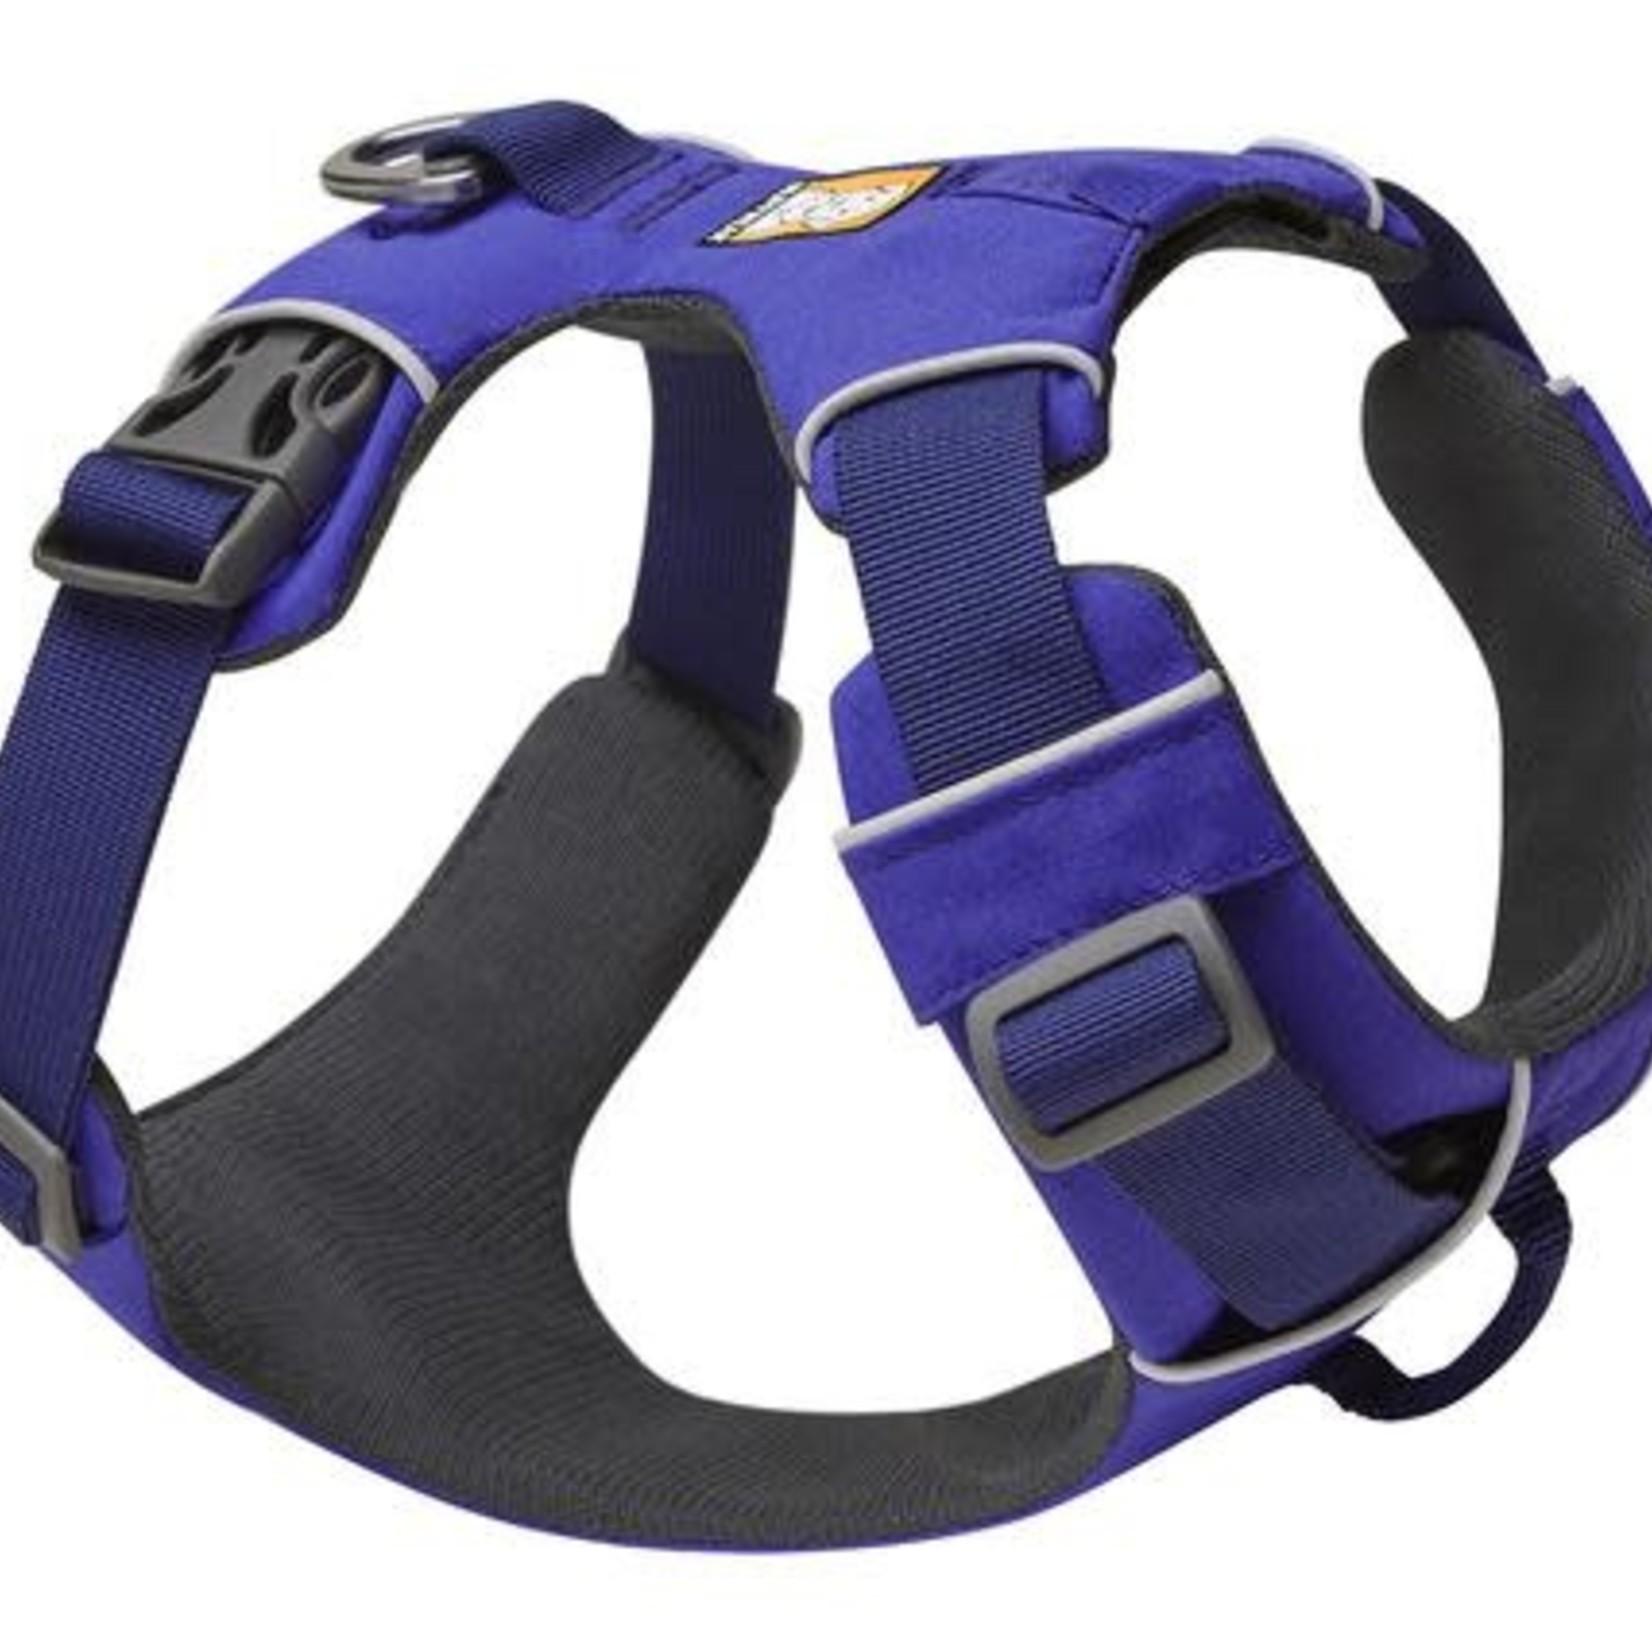 Ruff Wear Ruffwear Front Range Harness Huckleberry Blue Large / X-Large